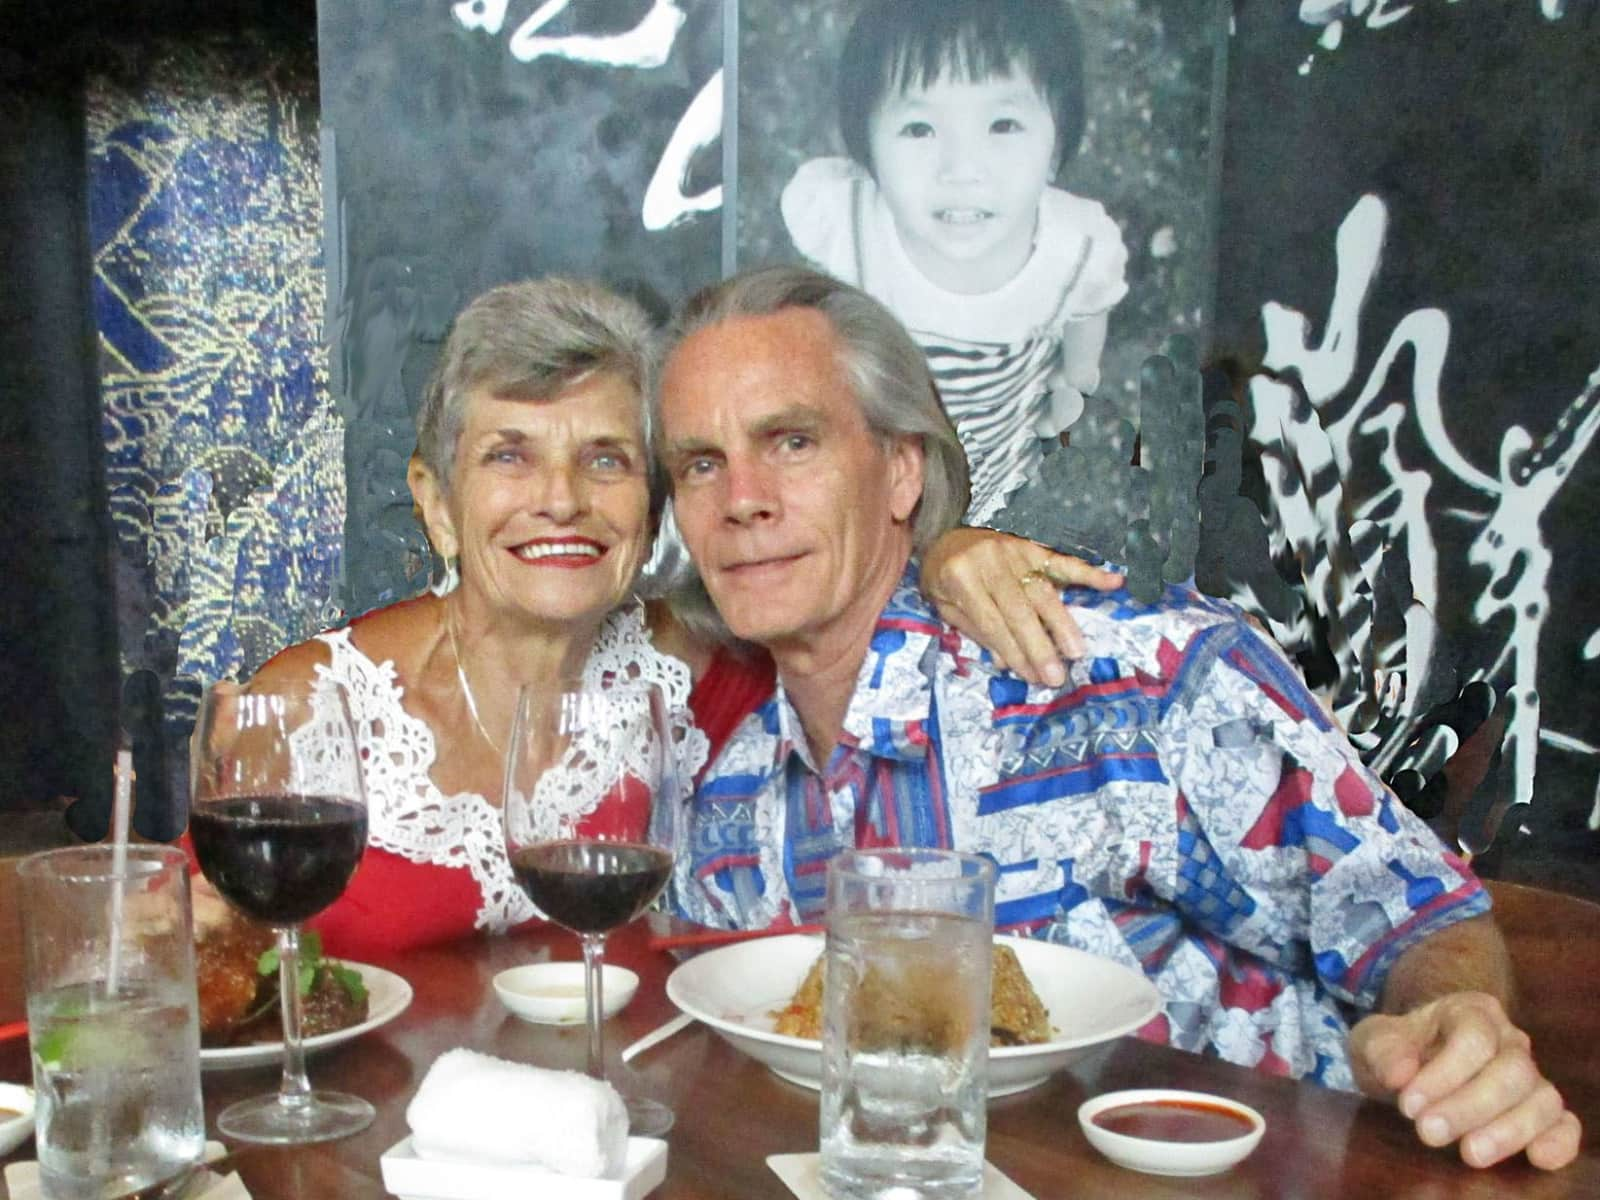 Peter & Lorraine from Orlando, Florida, United States